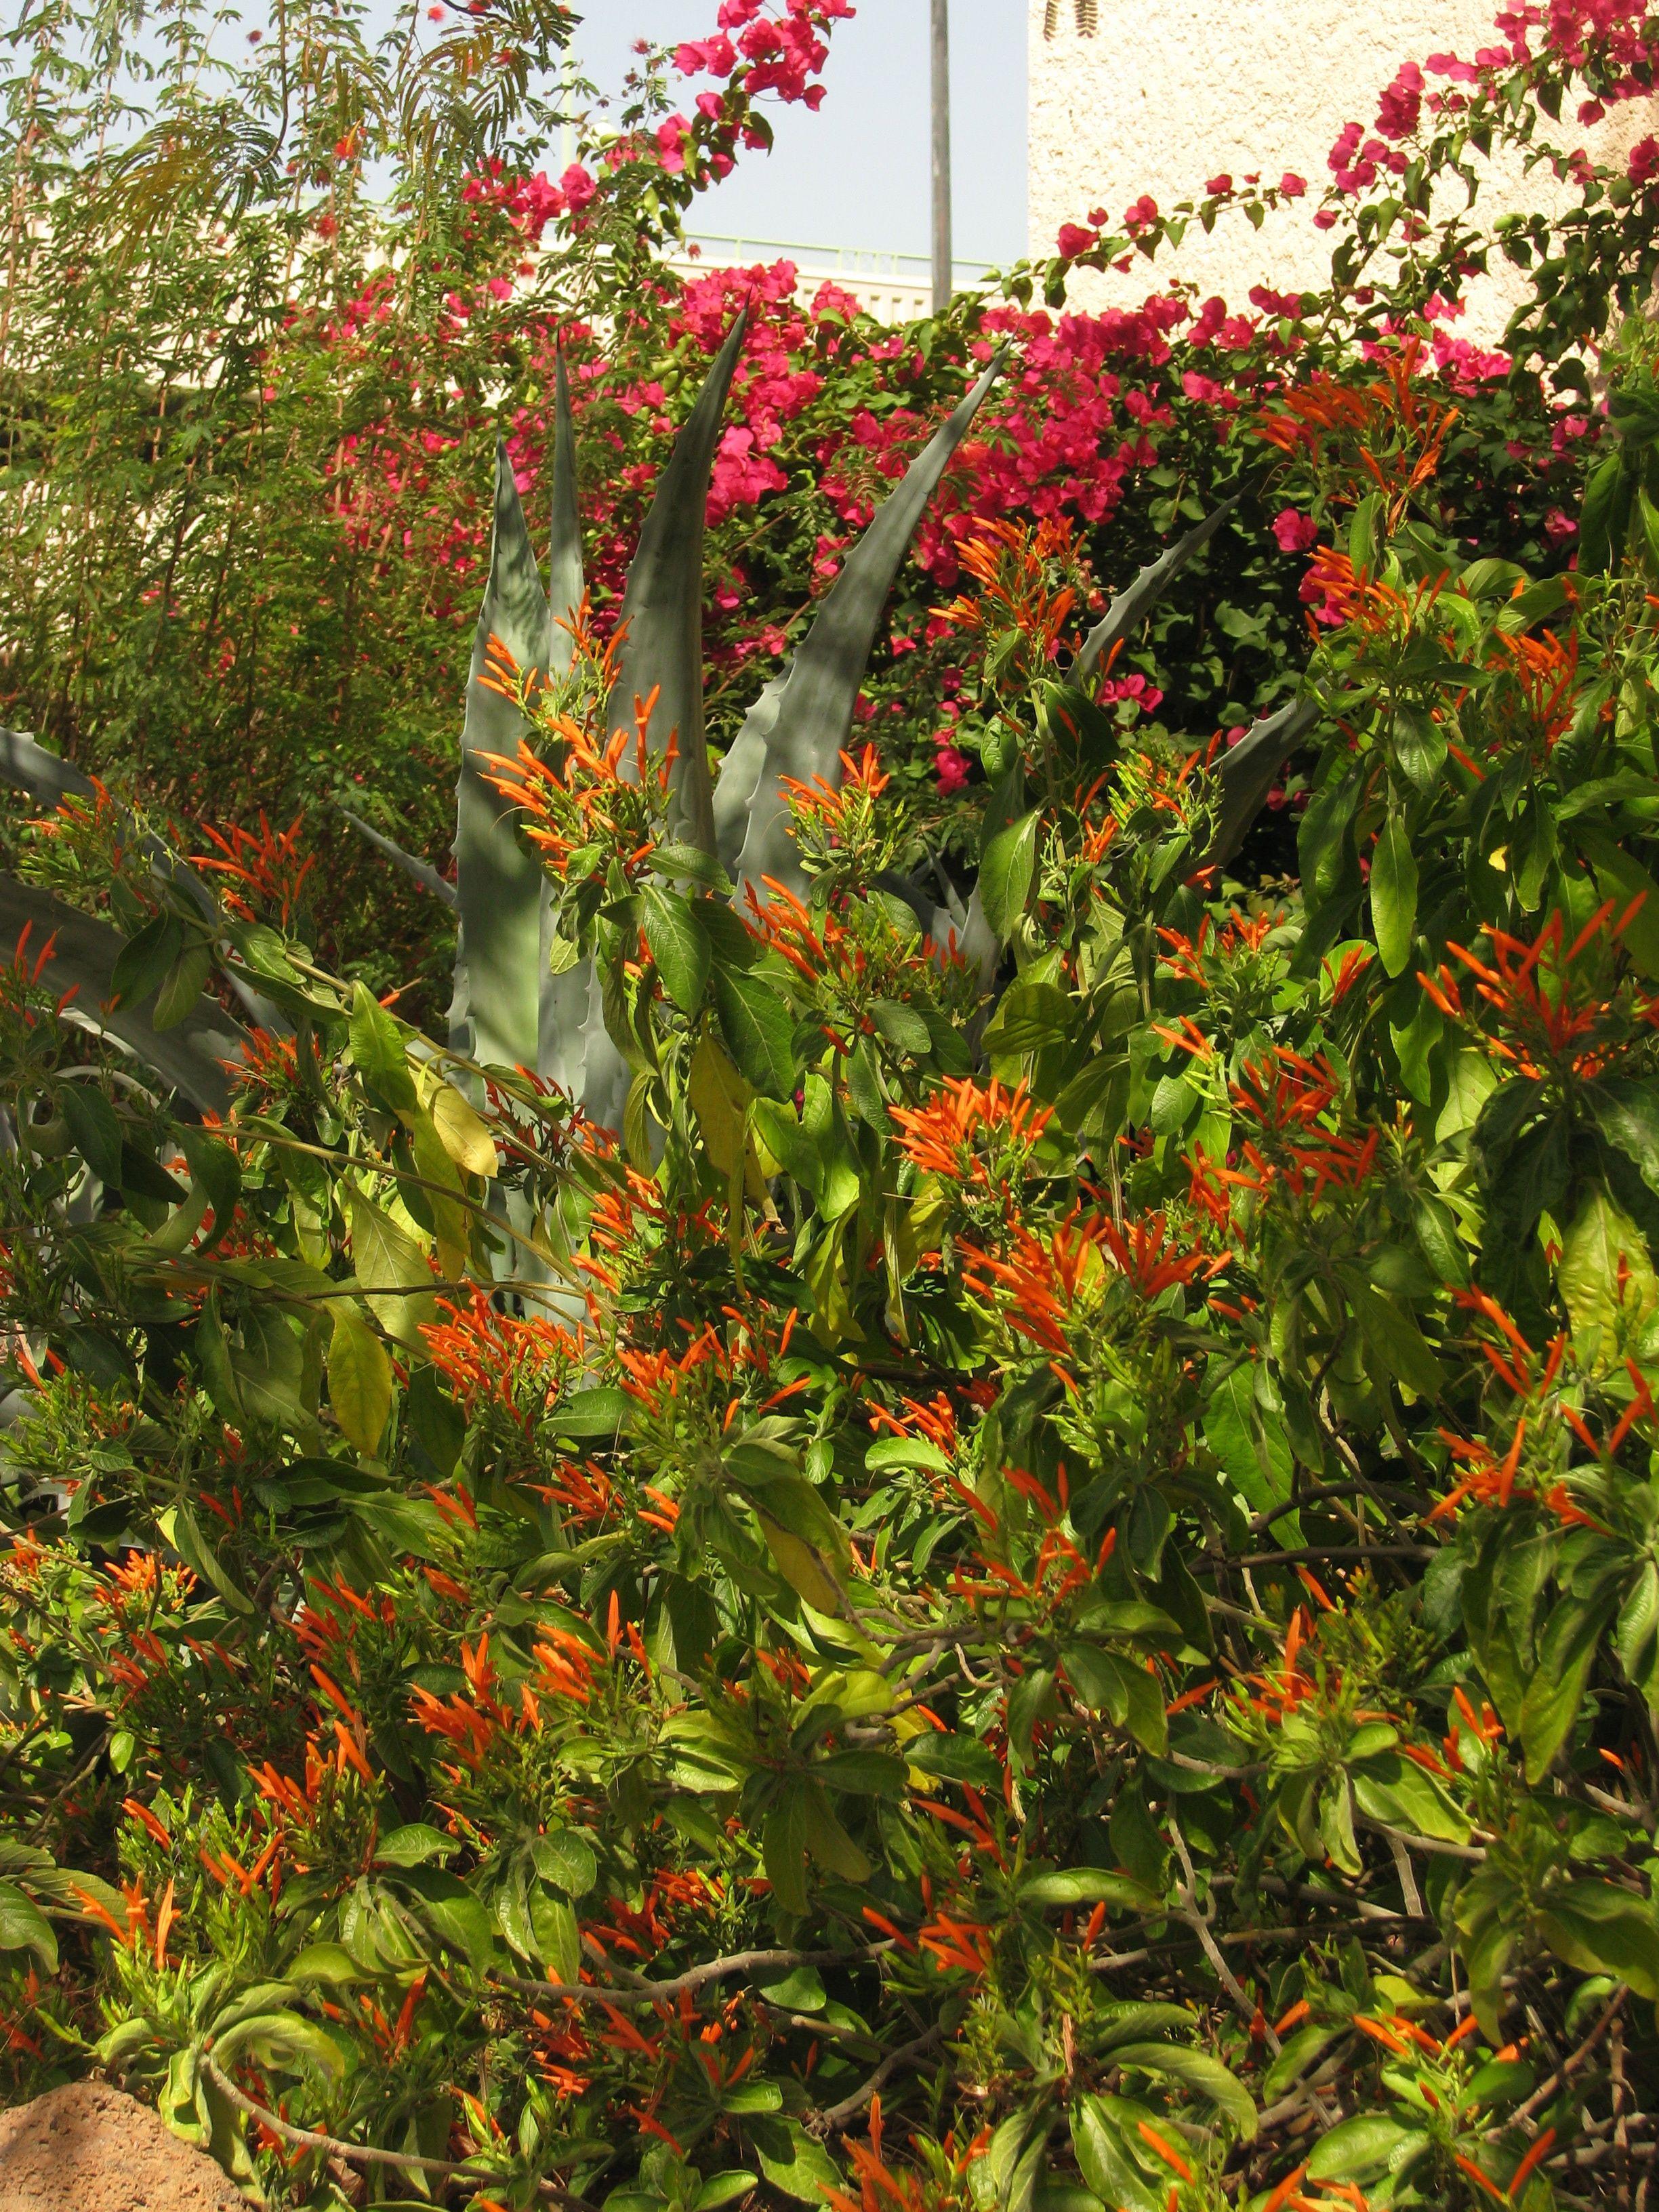 Red and orange flowers tucson pinterest orange flowers and tucson